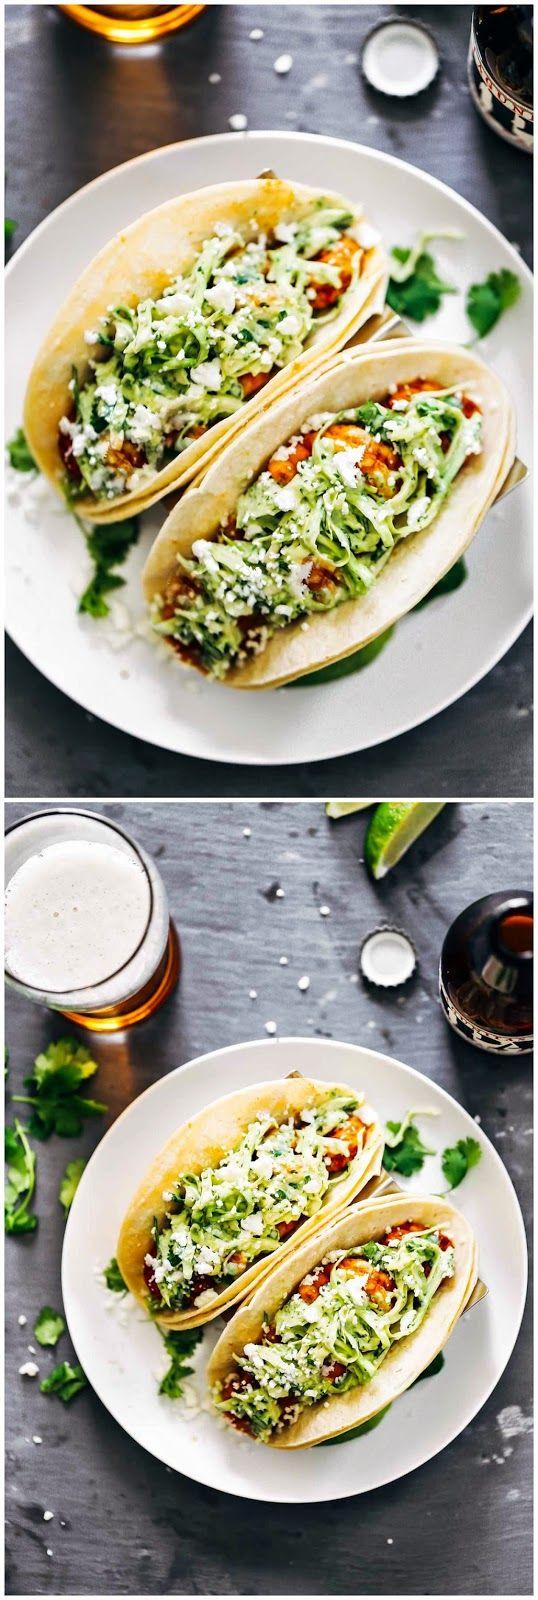 Spicy shrimp tacos with garlic cilantro lime slaw easy food recipe spicy shrimp tacos with garlic cilantro lime slaw easy food recipe blog forumfinder Images